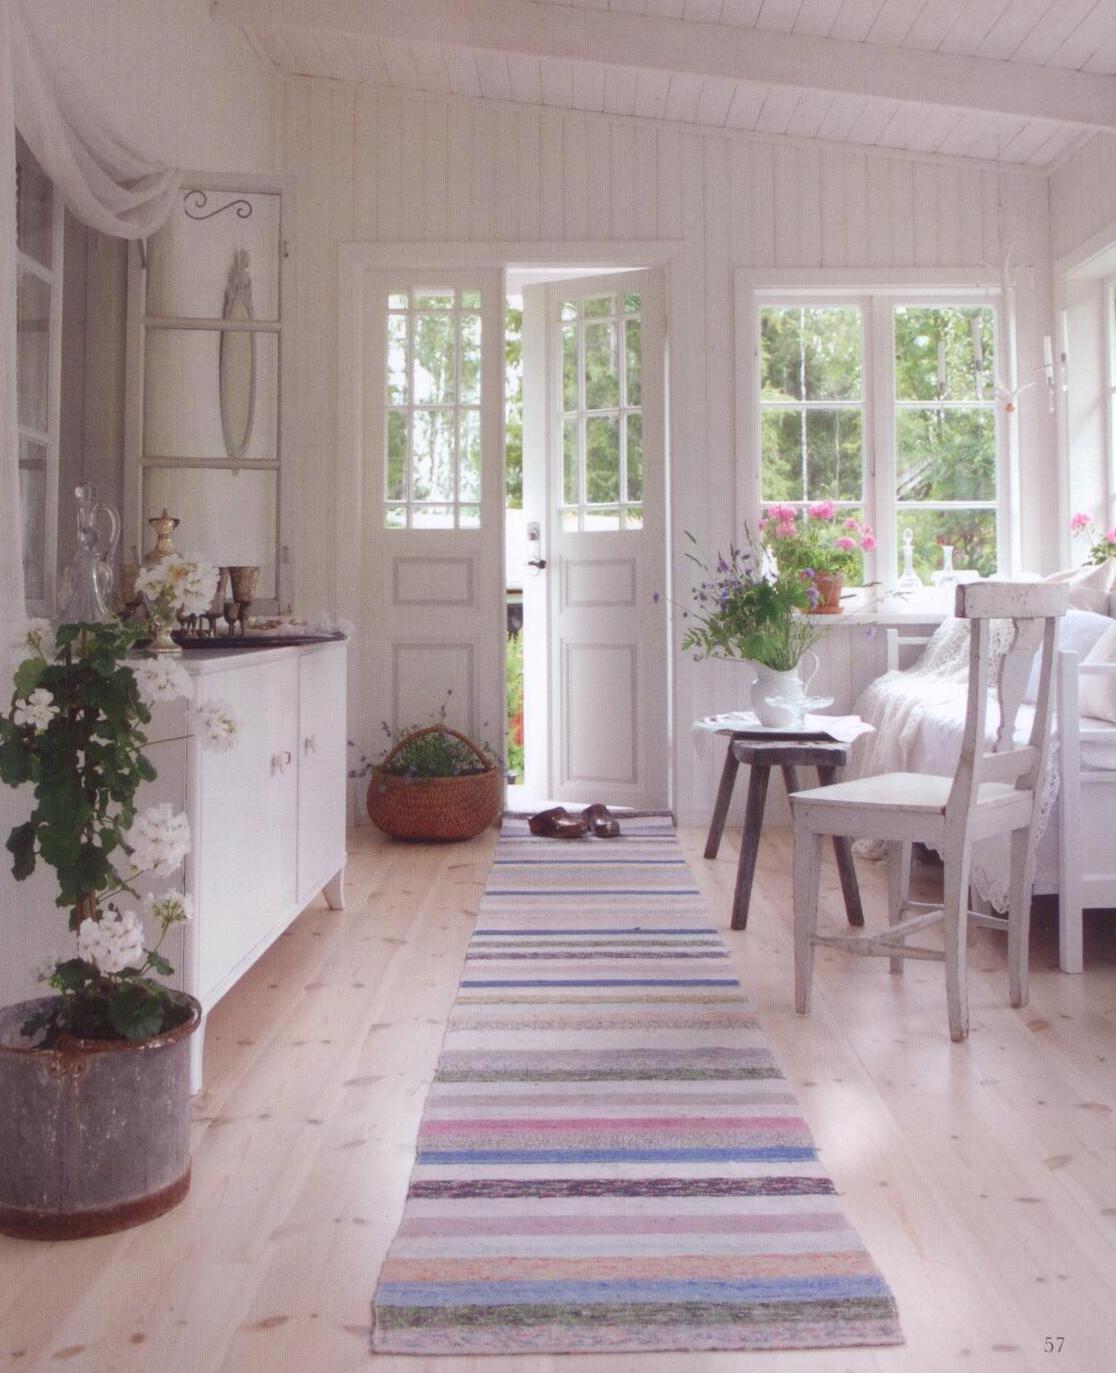 Cottage interior design pinterest alfombra de lana - Alfombras para recibidor ...